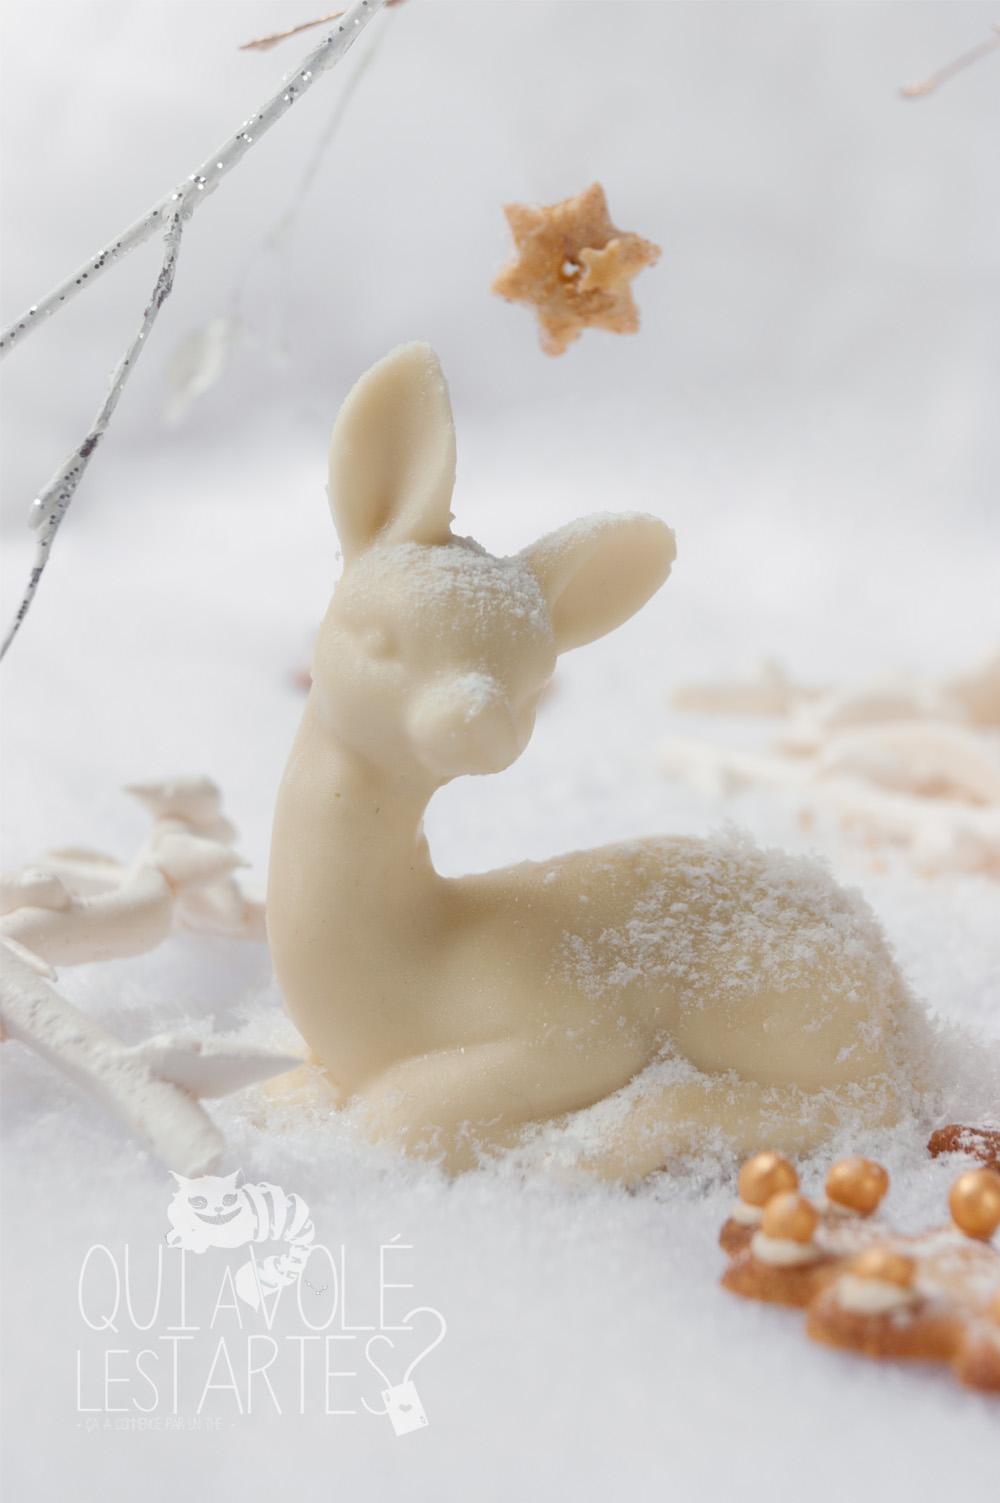 Nara 5 - charlotte sans gluten MatchaYuzu - Studio 2 créaion - Qui a volé les tartes